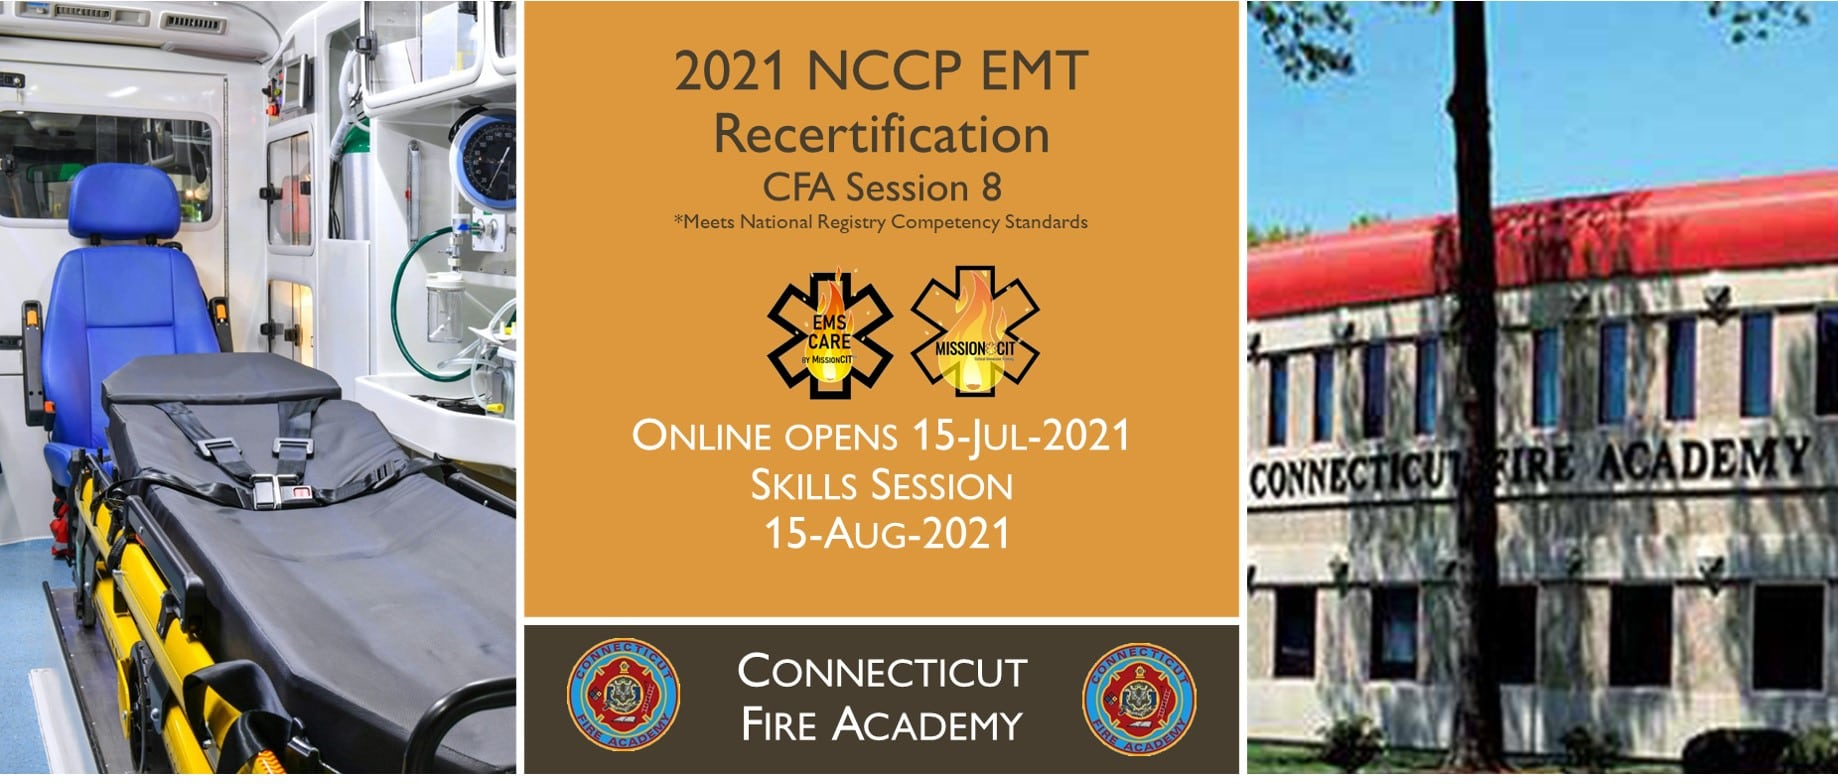 EMT NCCP Recertification | CFA | 2021 Session 8 | Connecticut emt training | meets NREMT, CAPCE requirement for EMTs | National Registry